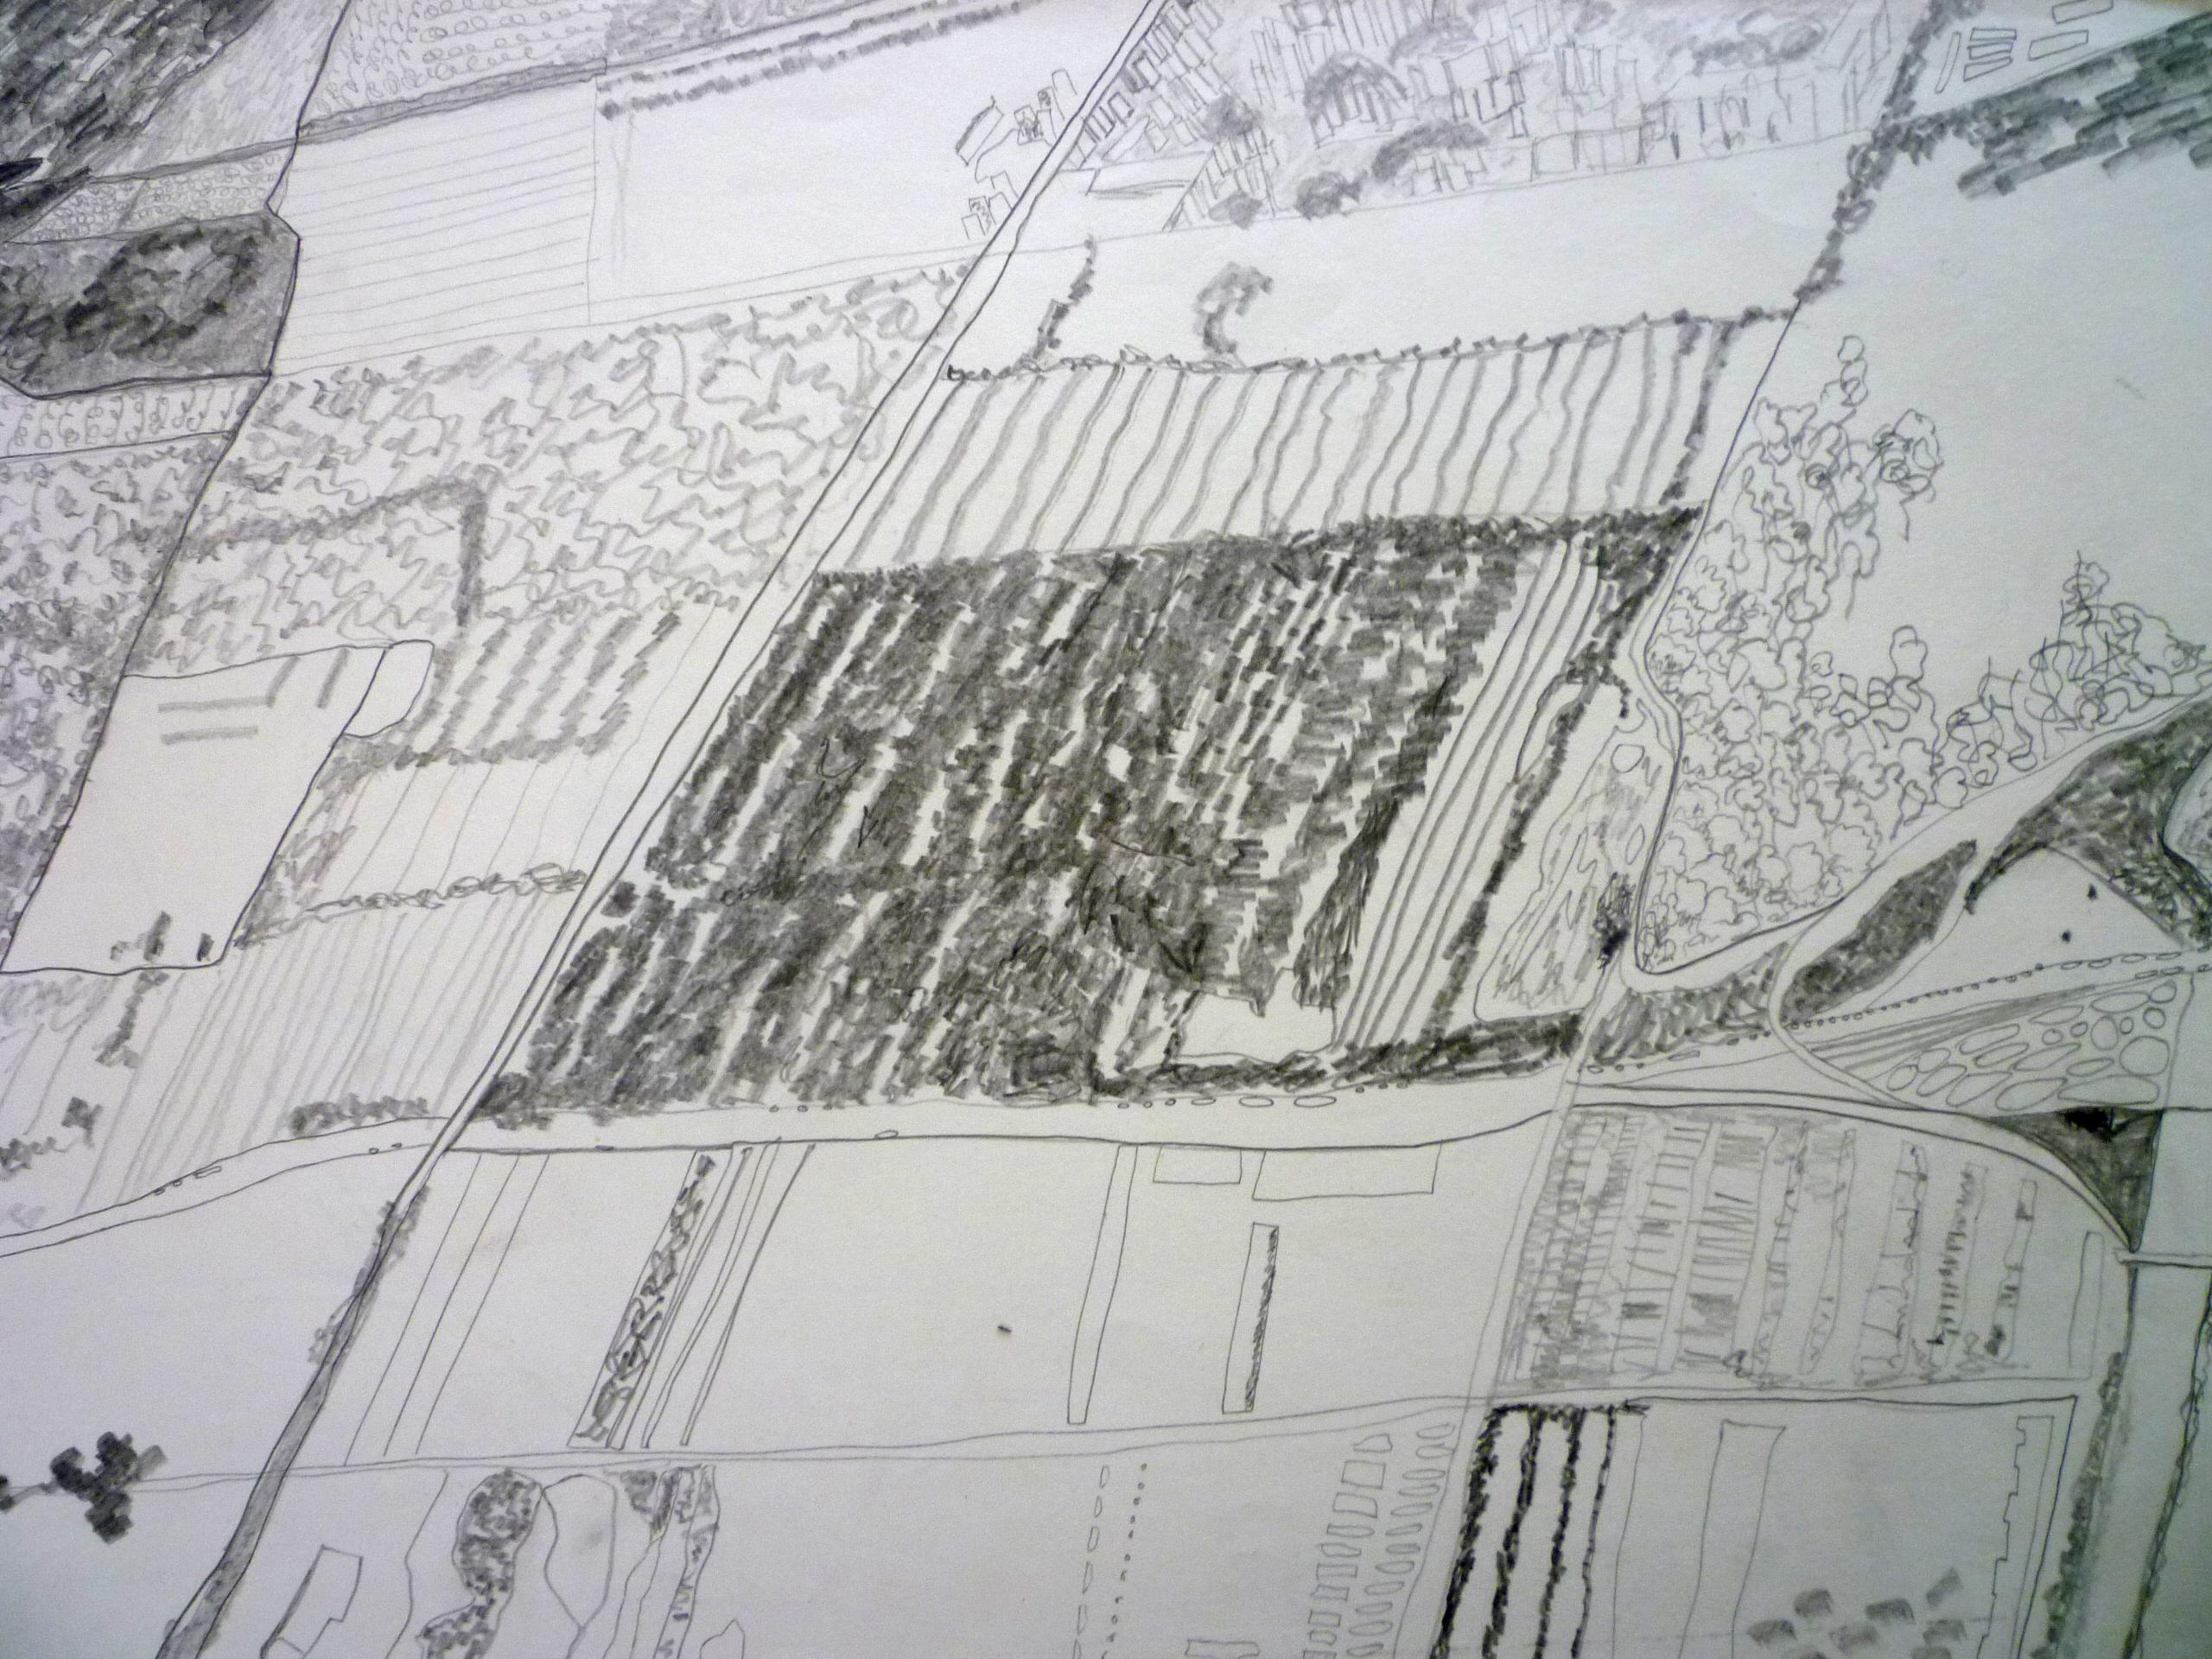 Aerial view 36x51cm [pencil]